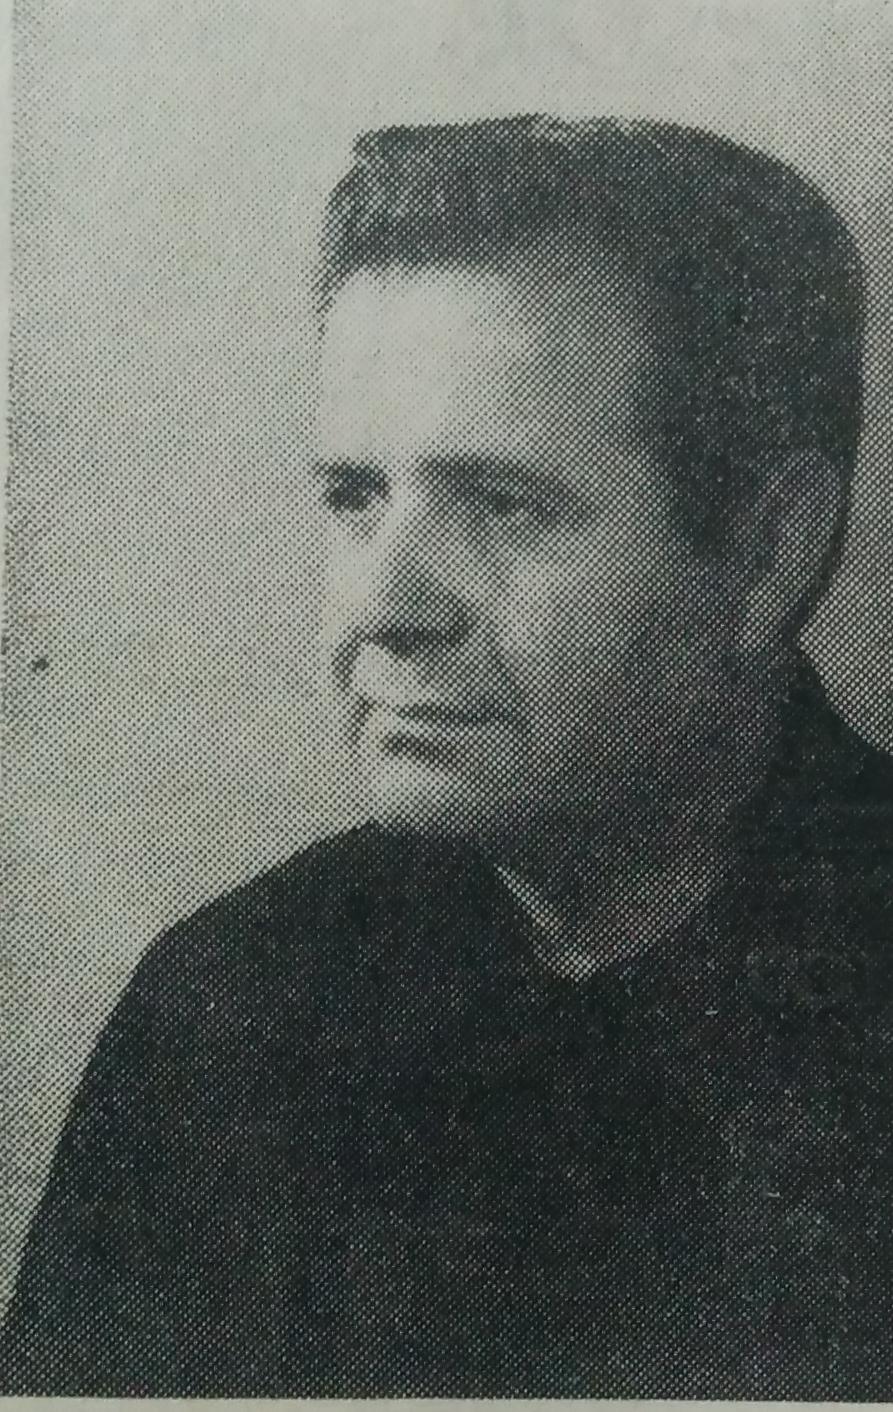 Héctor Manuel Antuña (1932-2001).